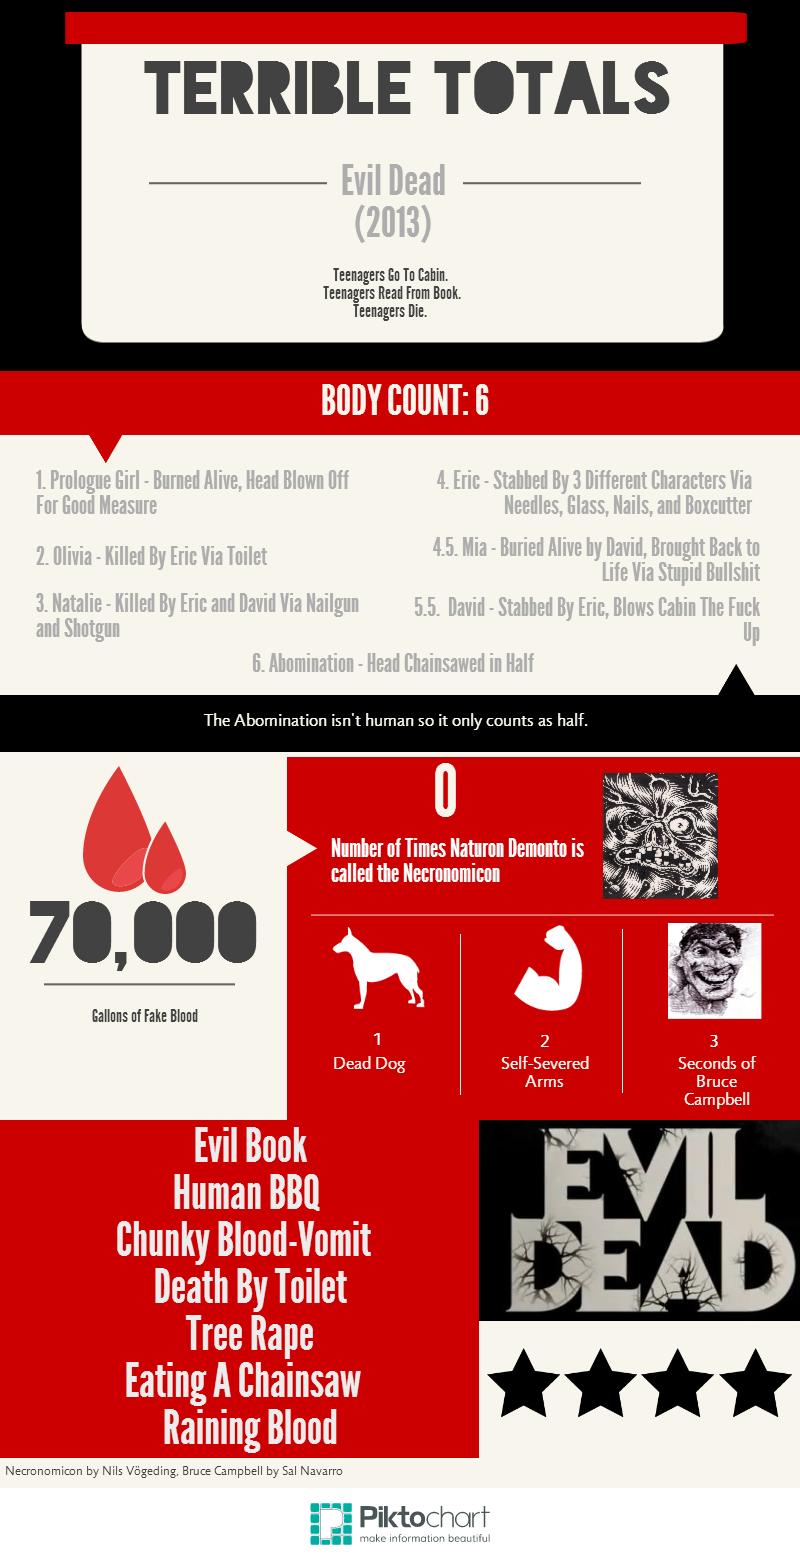 evil dead infographic